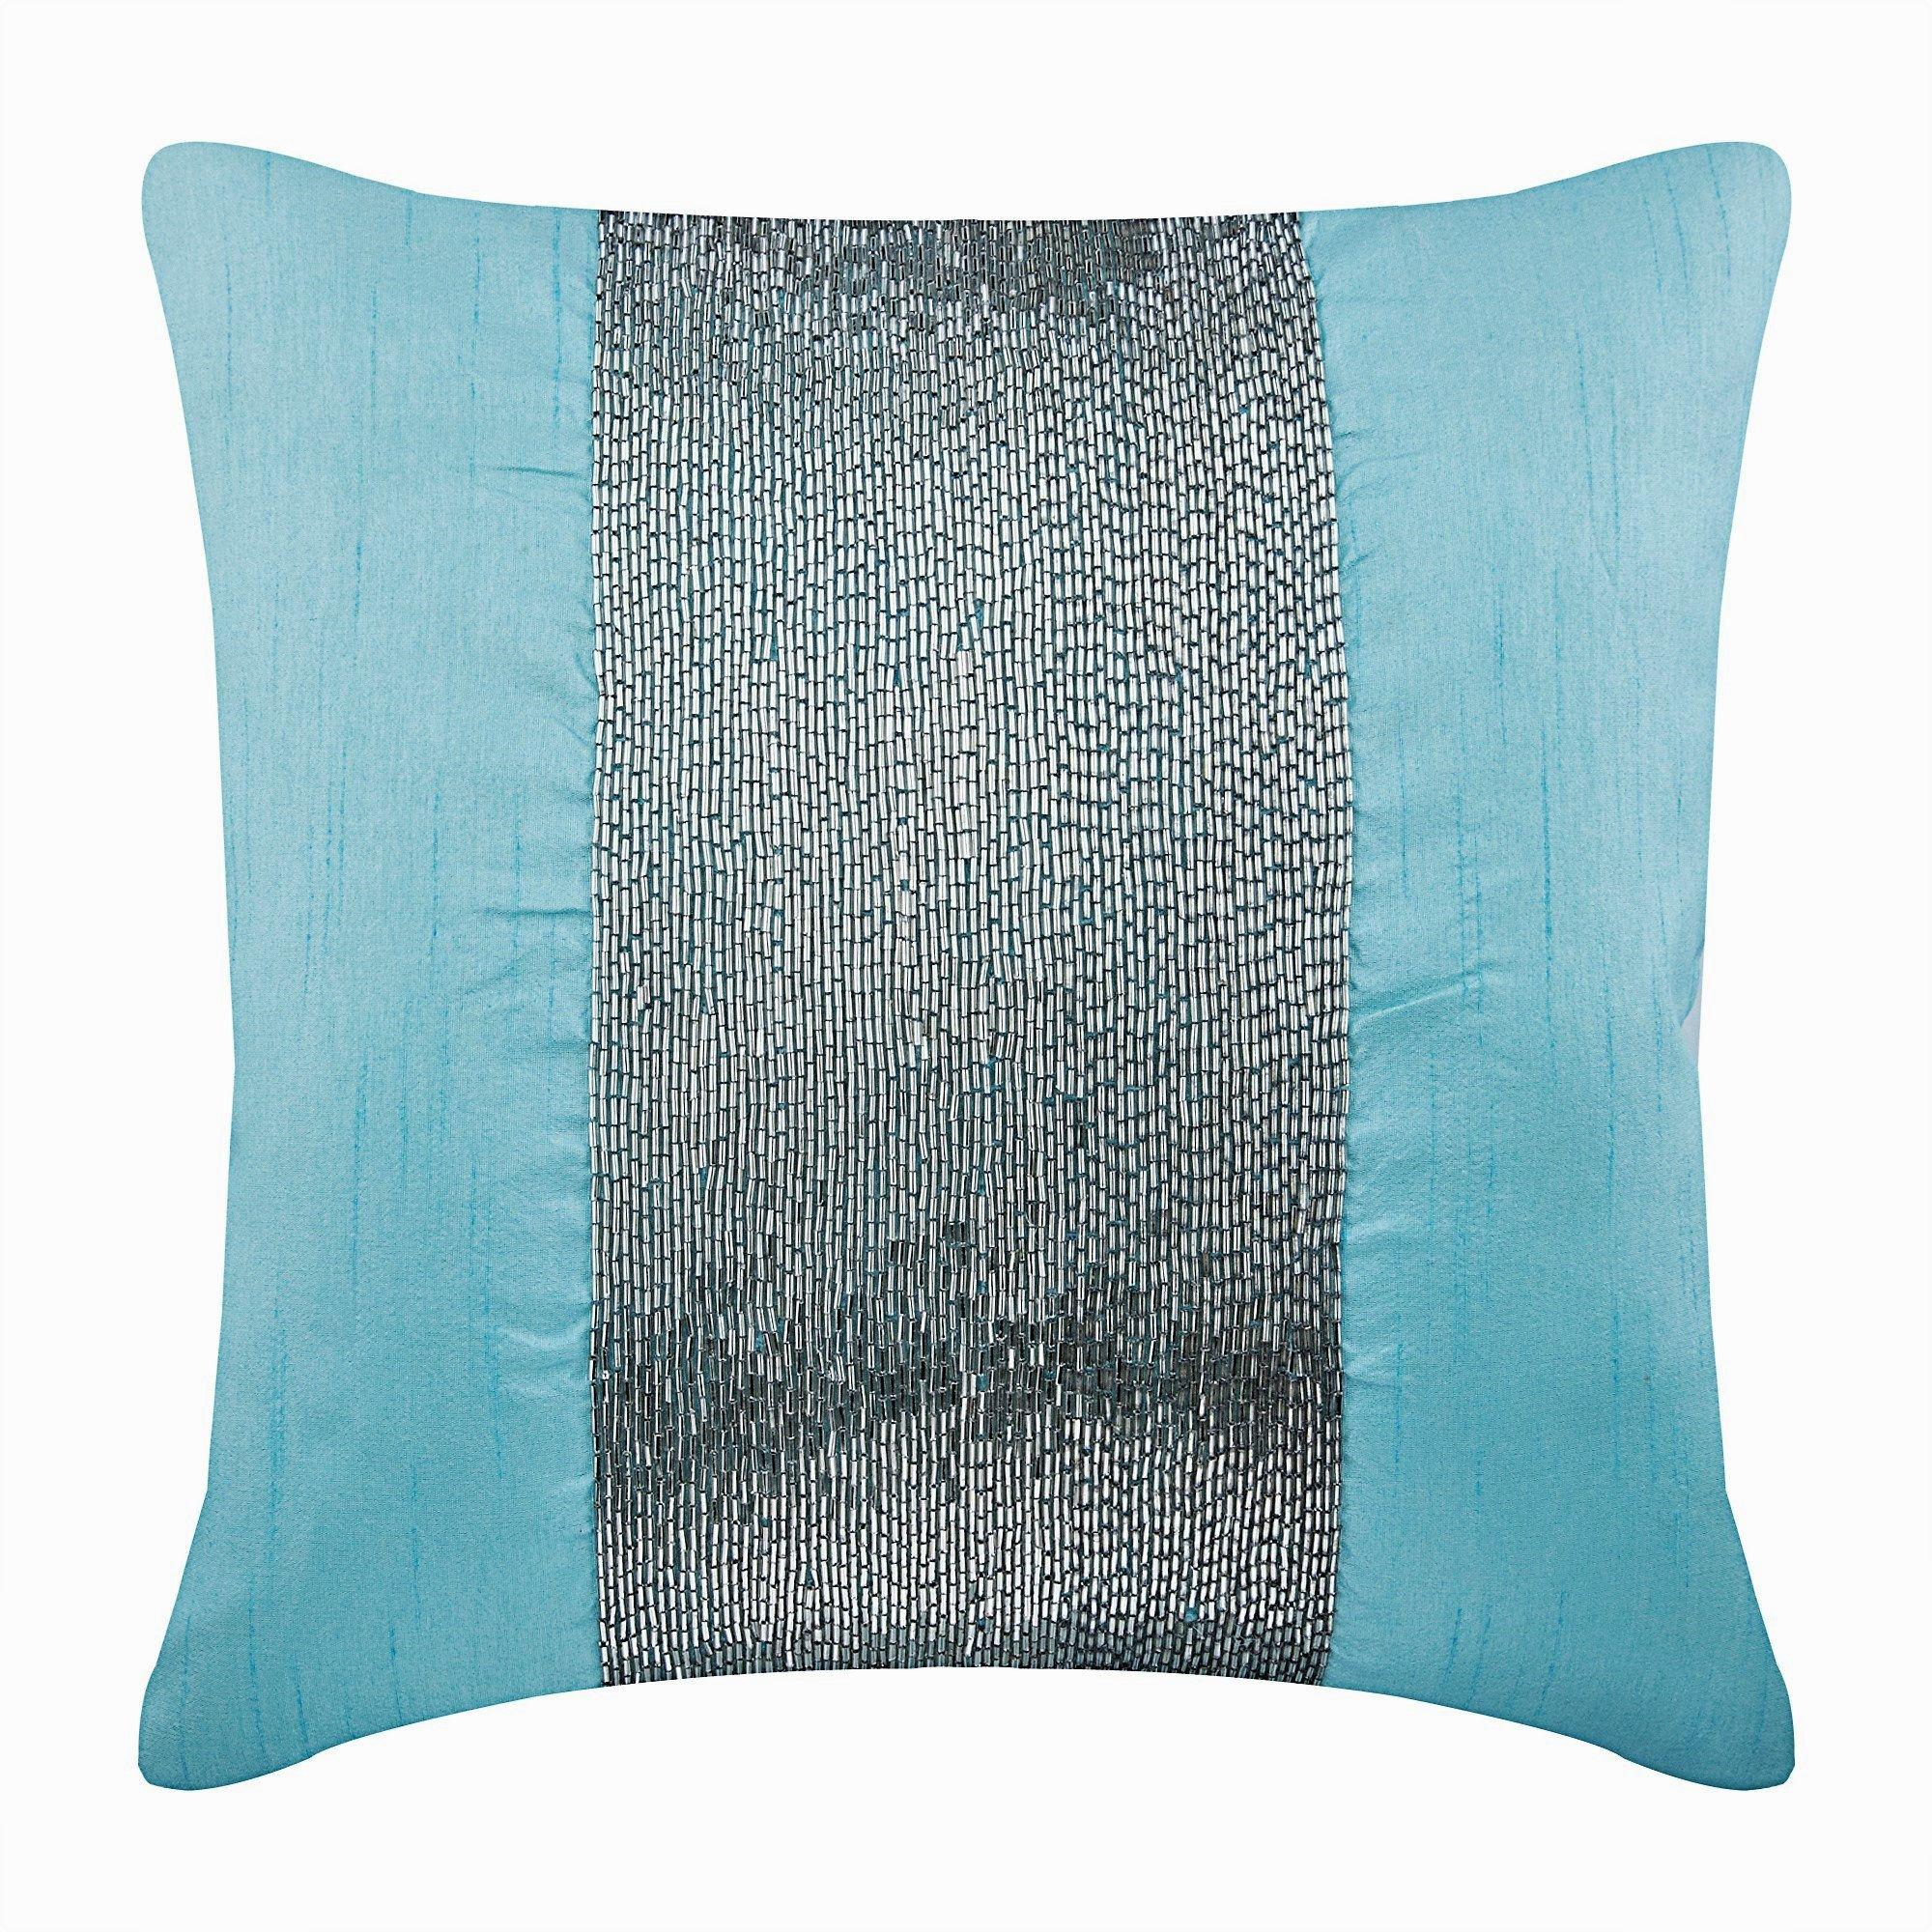 Designer Aqua Blue Cushions 16x16 Art Silk Throw Etsy Silk Throw Pillows Throw Pillow Covers Throw Pillows